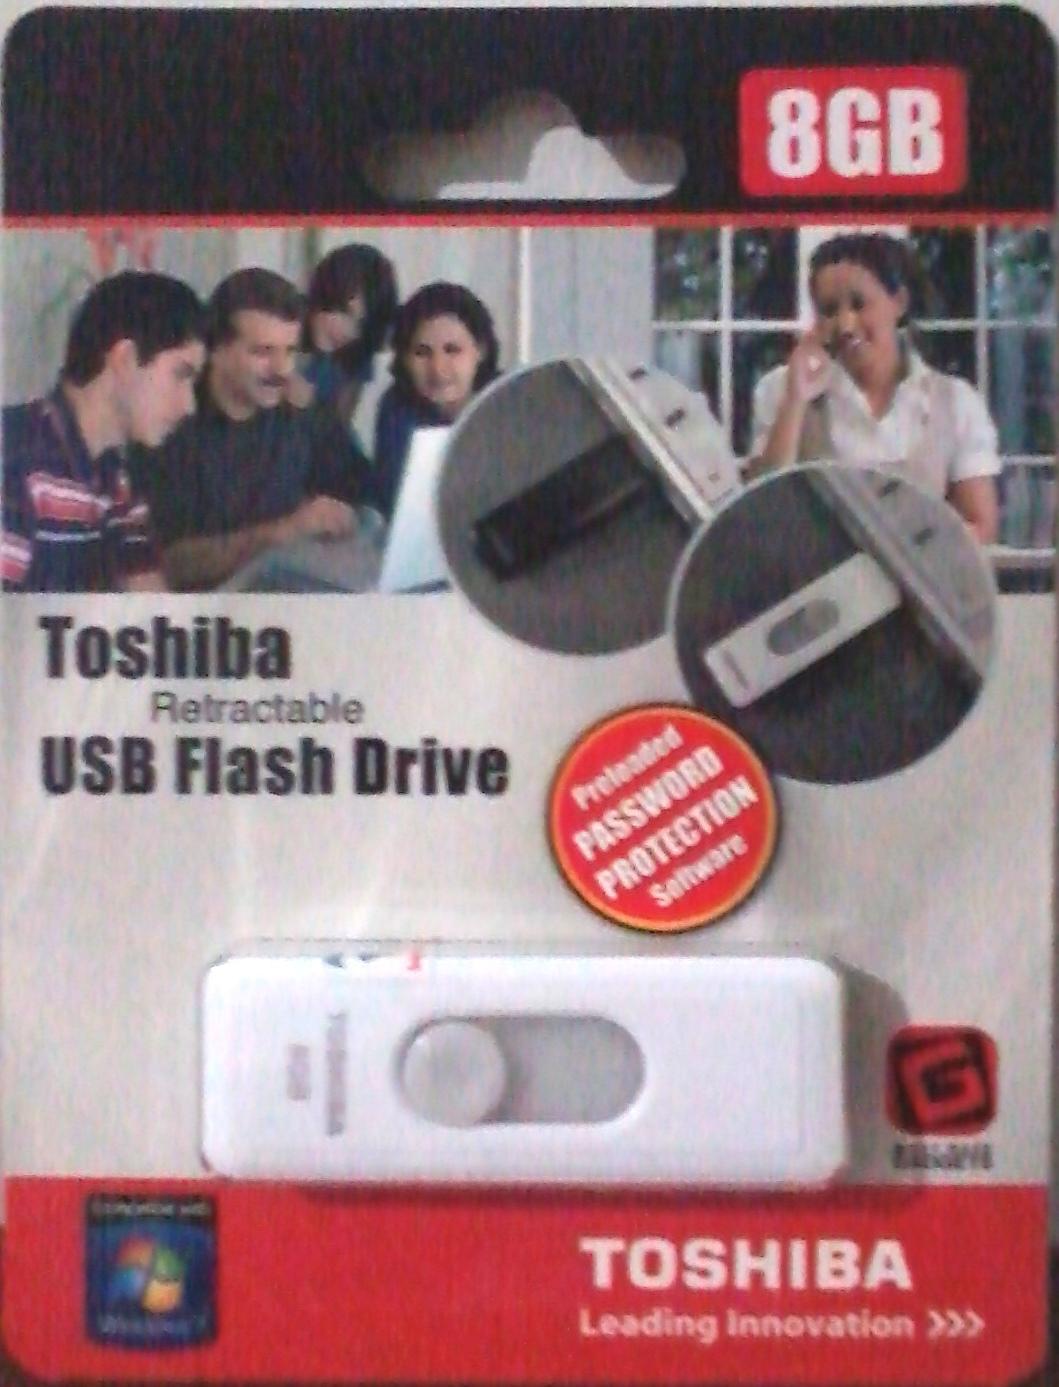 Harga Flashdisk Toshiba Hayabusa 8gb Oem Terbaru 2018 2gb Packing Hijau Daftar Flasdisk 8 Gb Flash Disk Portal Community Agustus 2012